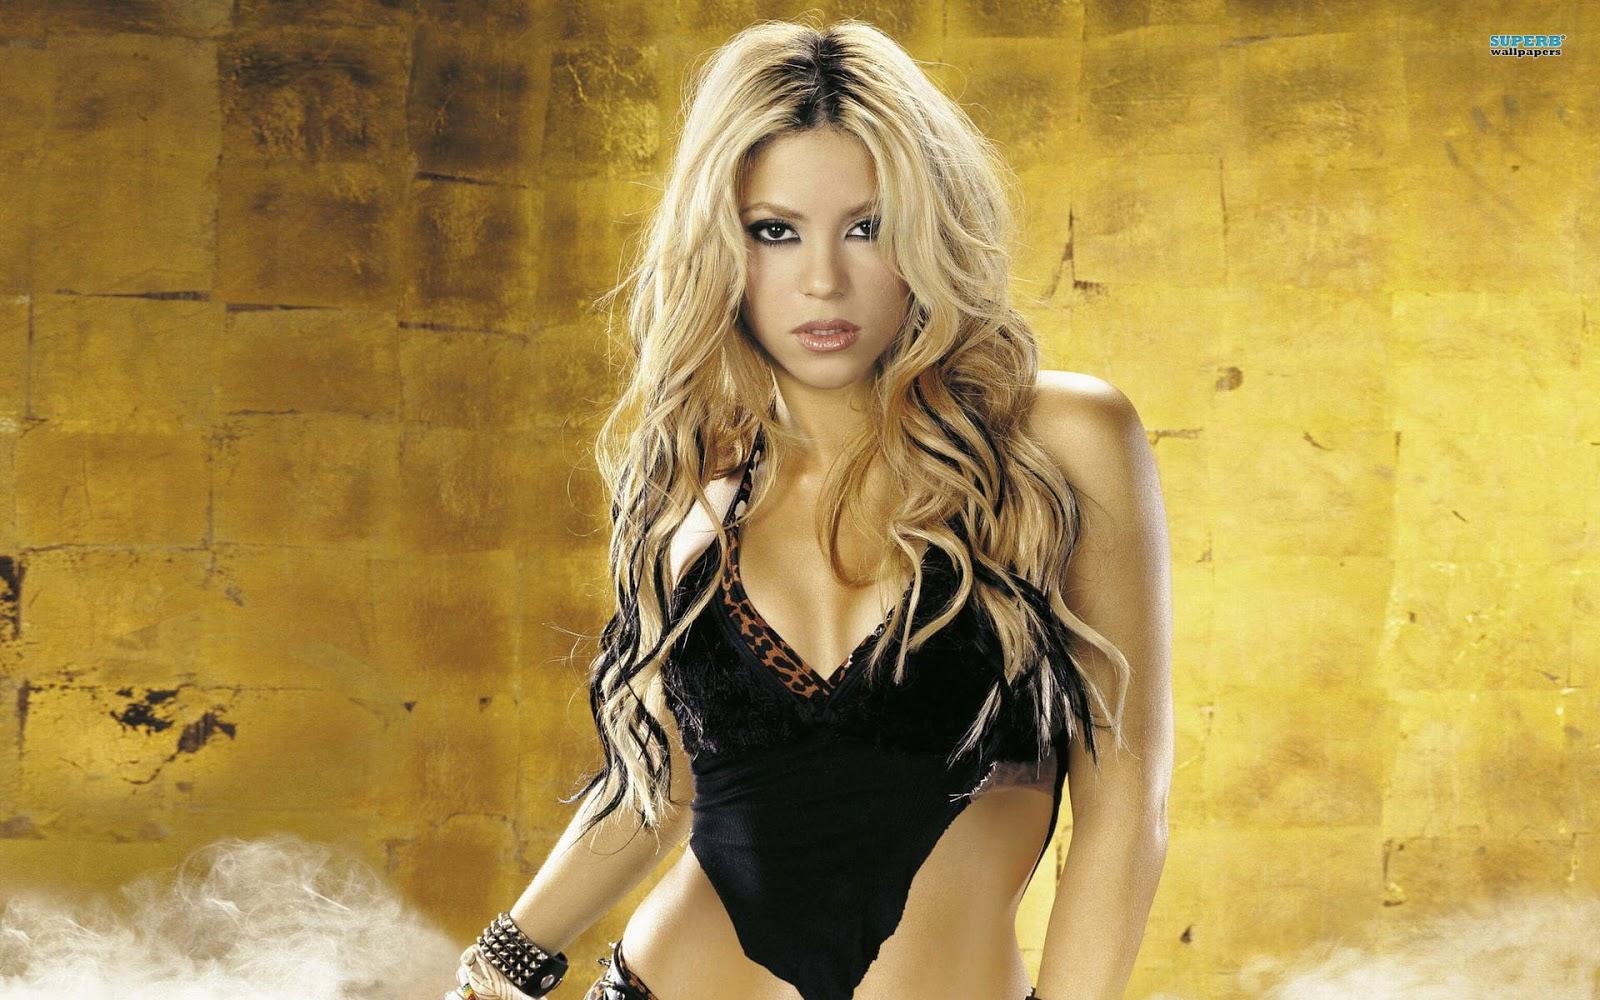 High Resolution Wallpaper Shakira Hd Wallpapers-2786